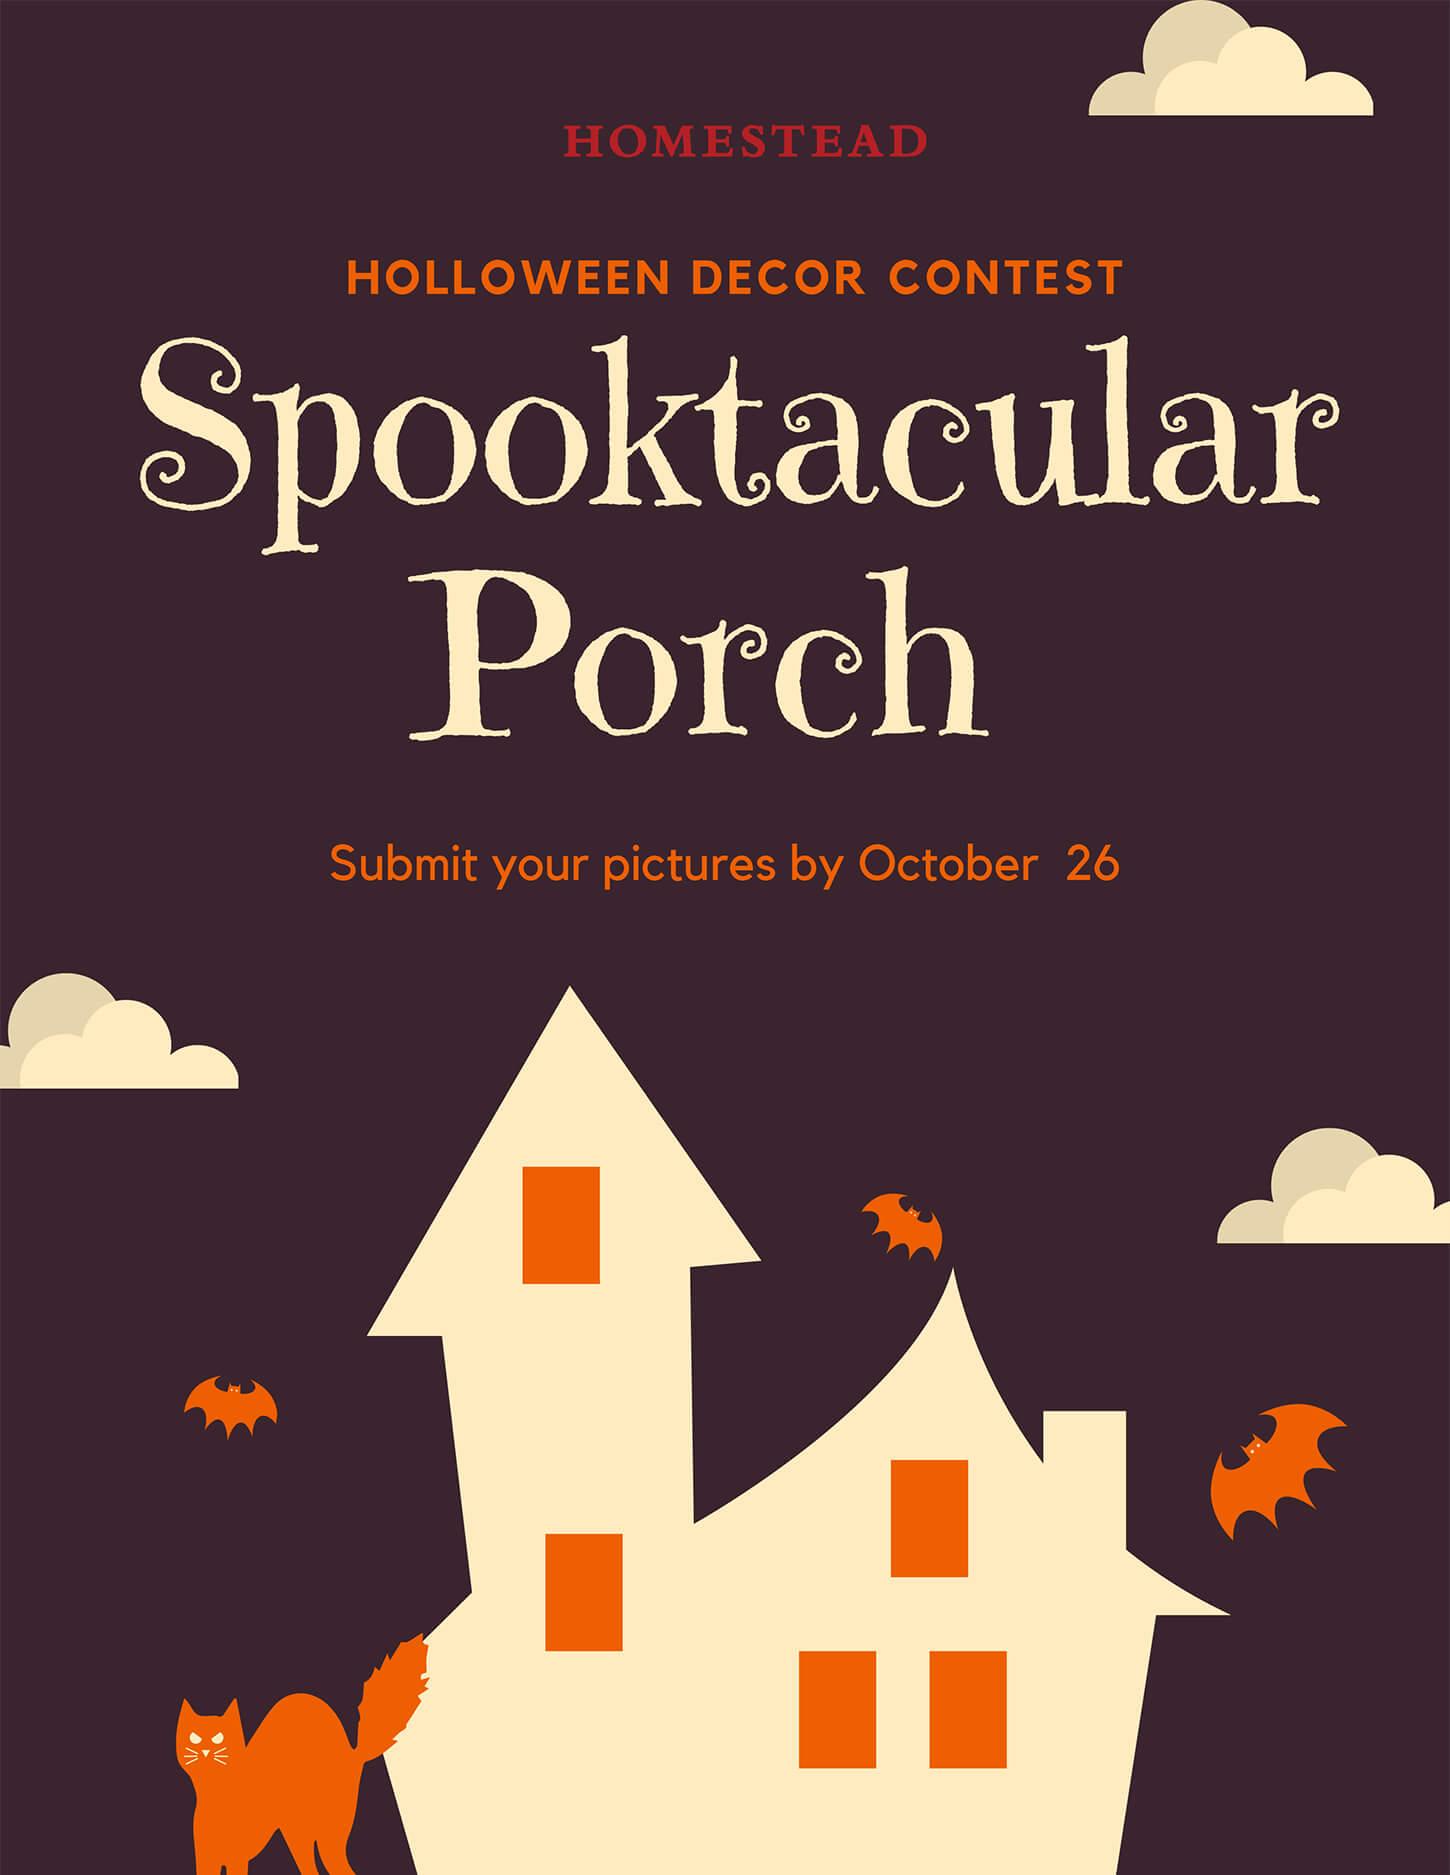 Spooktacular Porch